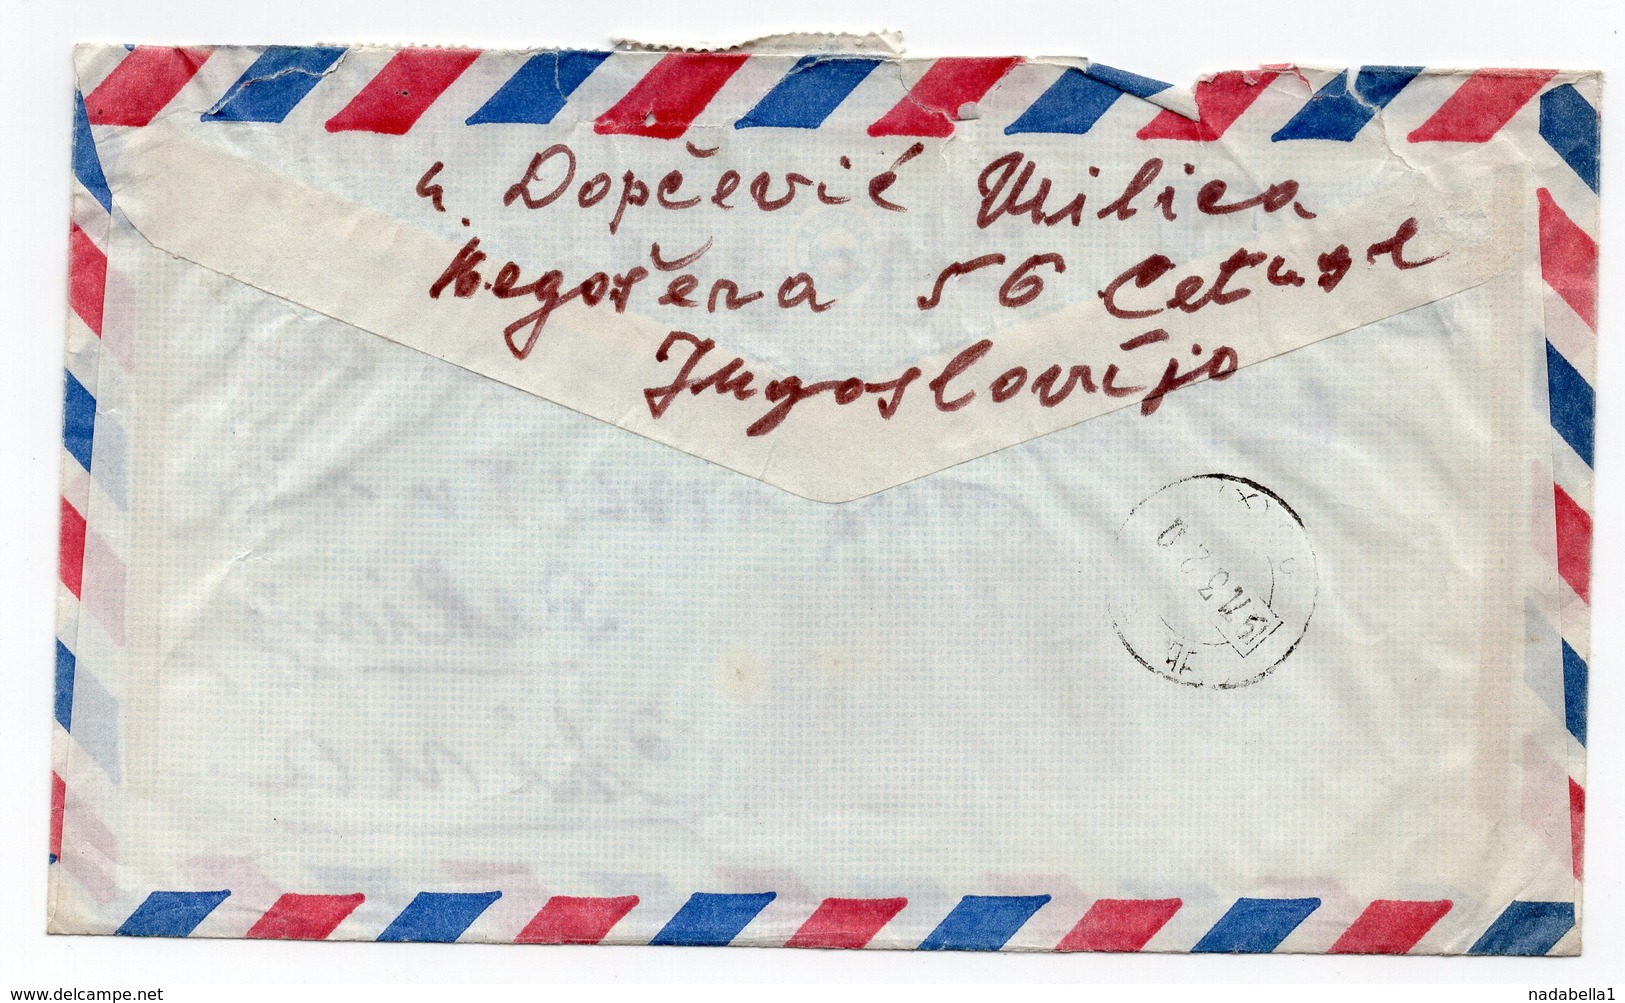 1971 YUGOSLAVIA, MONTENEGRO, CETINJE TO PEKING, BEIJING, CHINA, TITO, AIR MAIL, RECORDED MAIL - 1945-1992 Socialist Federal Republic Of Yugoslavia